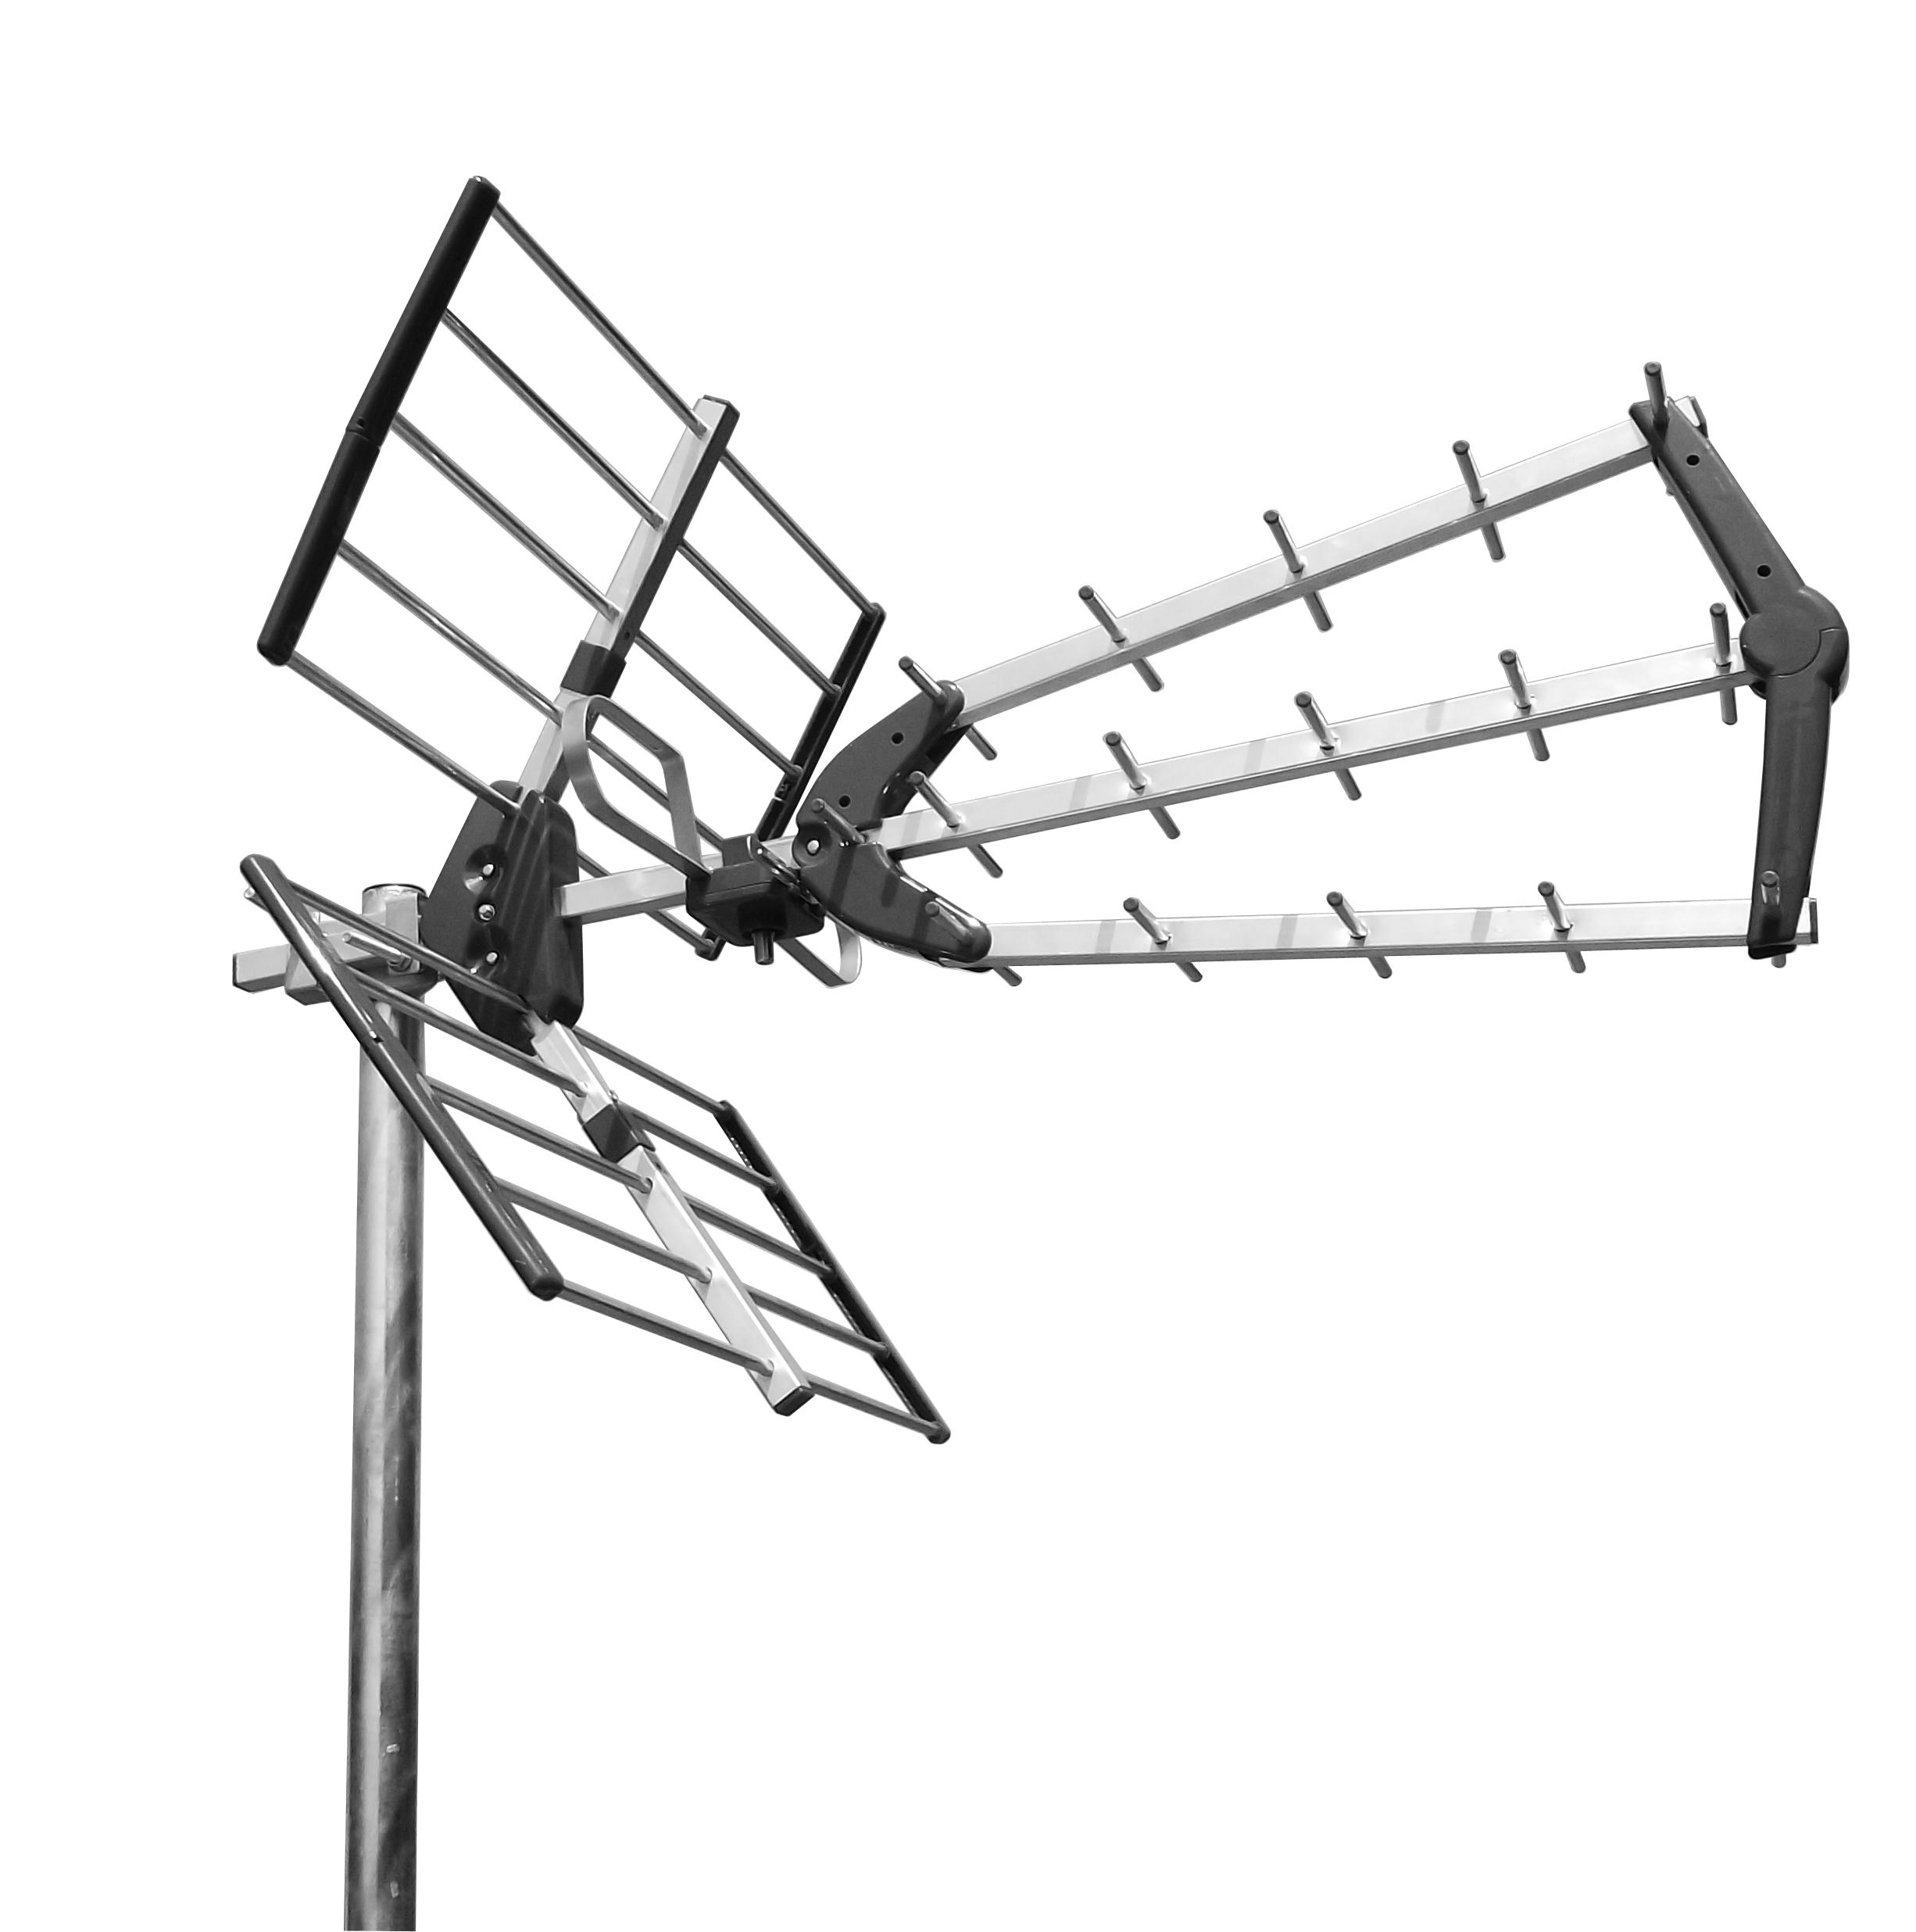 xt31 u002687 tri-beam antenna